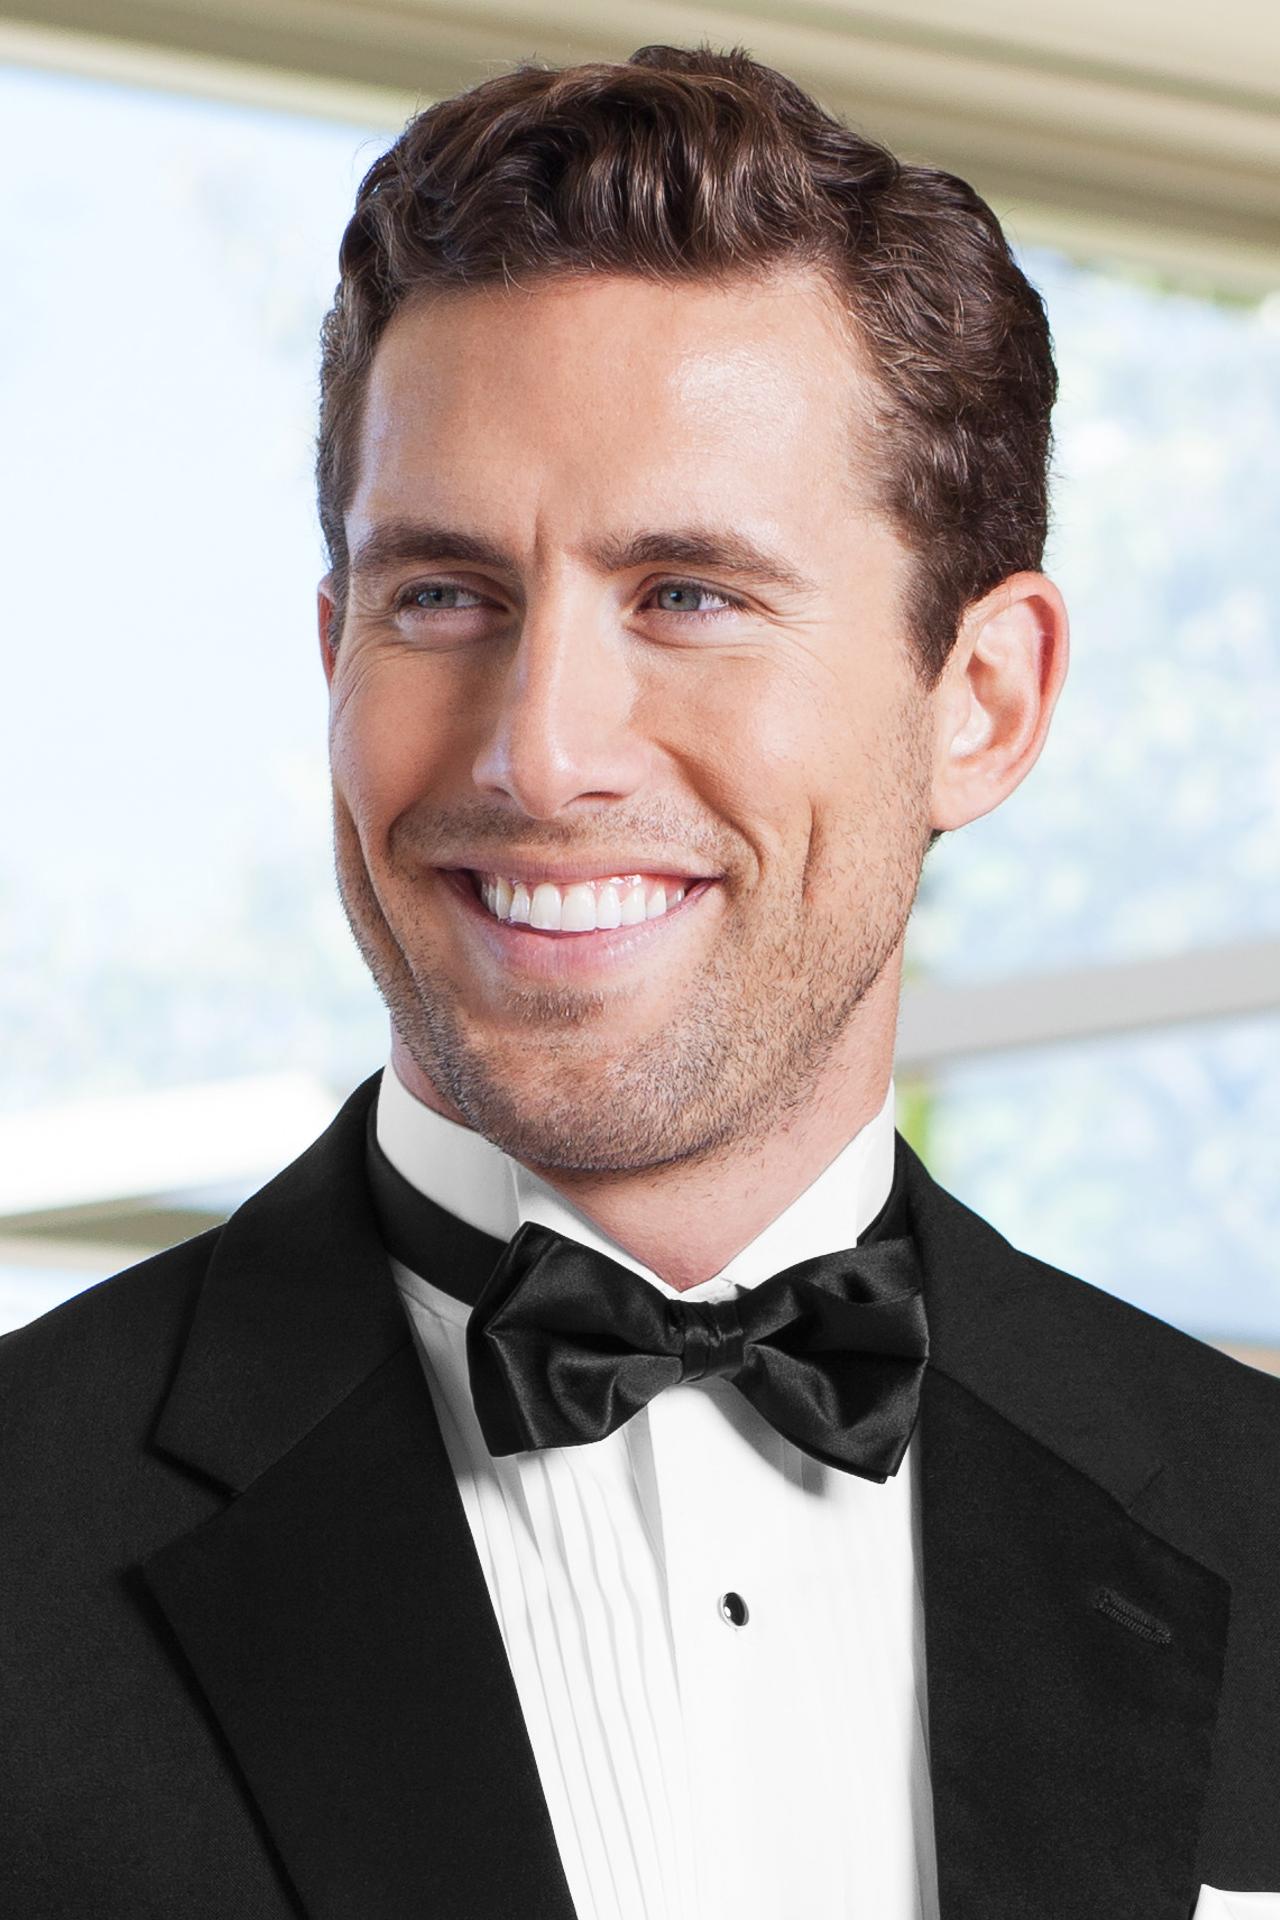 bow tie satin black BSAT - Western Wedding Tux